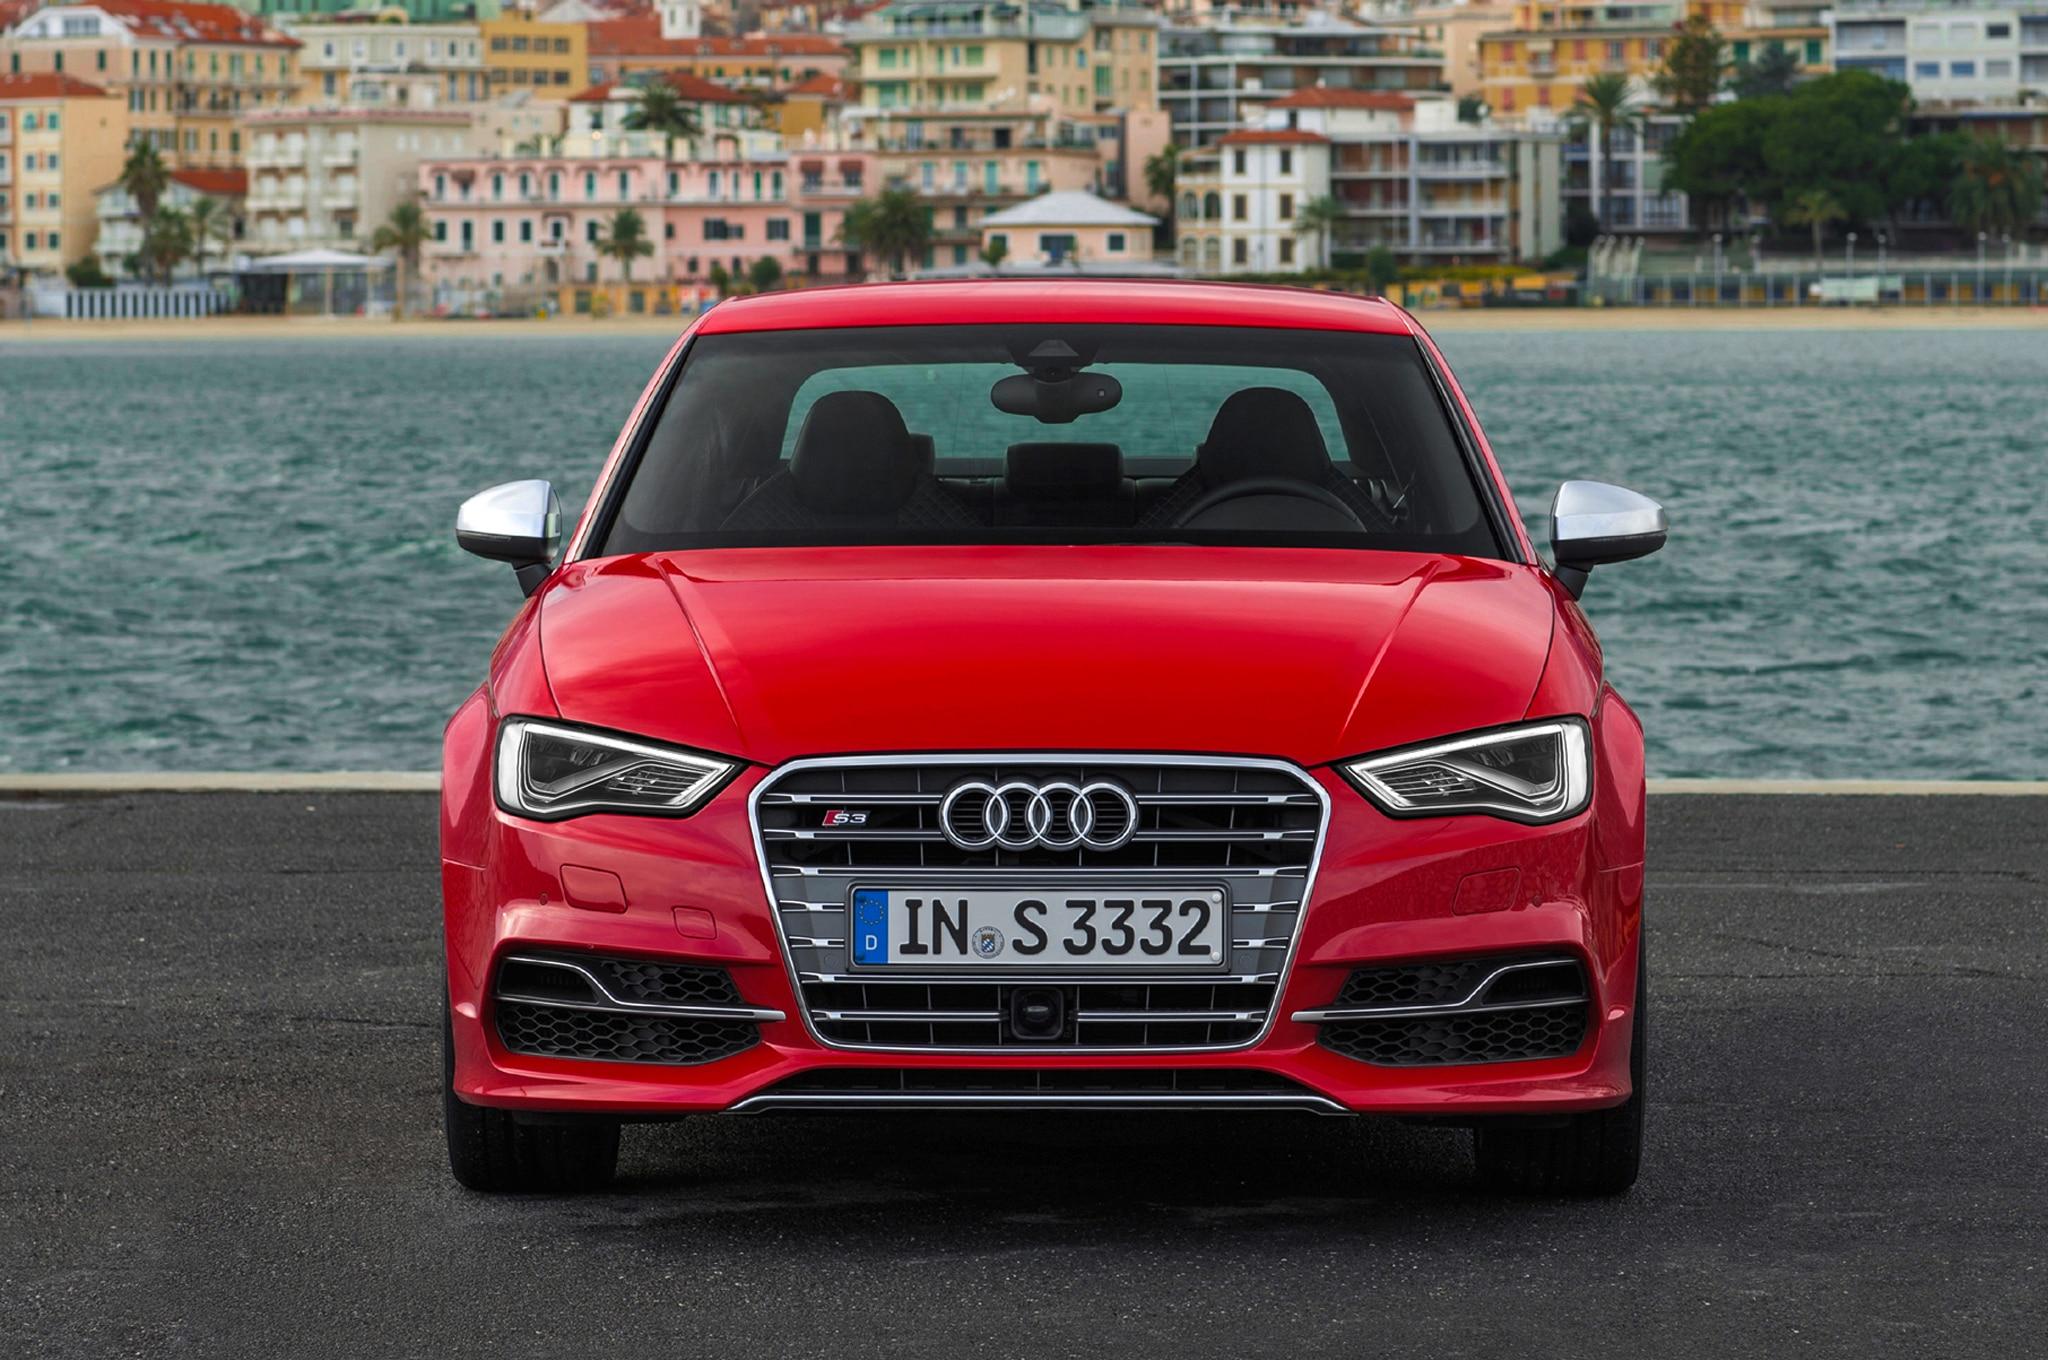 2015 Audi S3 Front Profile